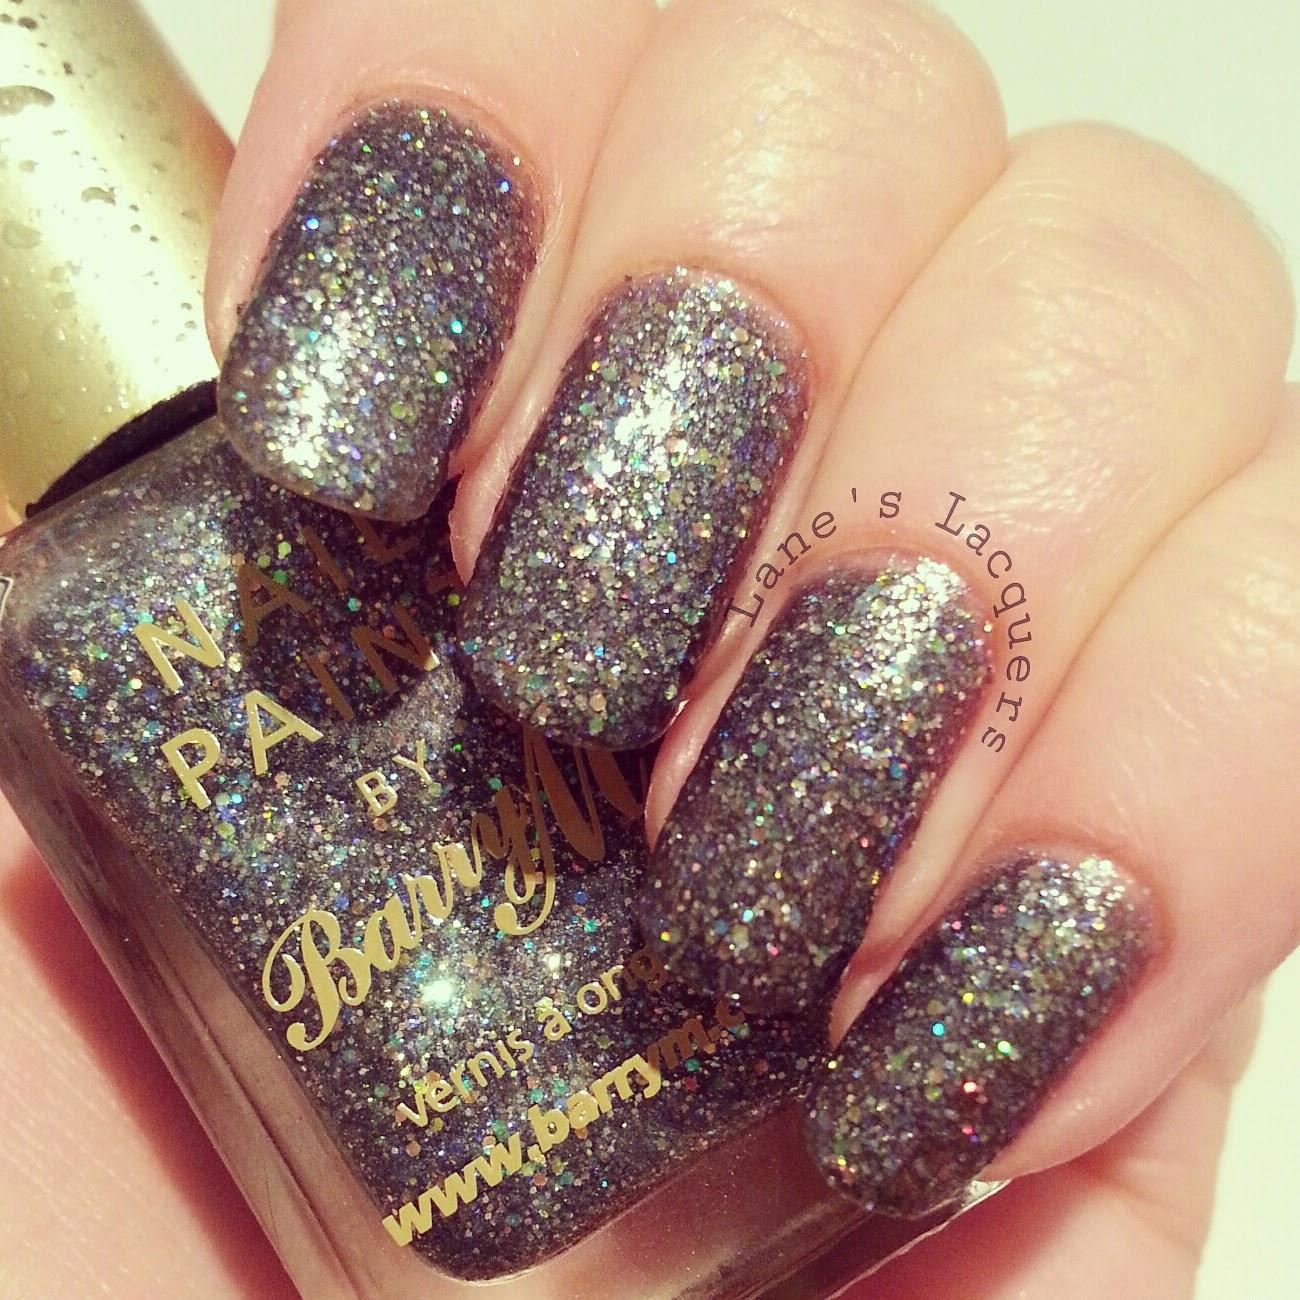 new-barry-m-glitterati-rockstar-swatch-manicure (2)